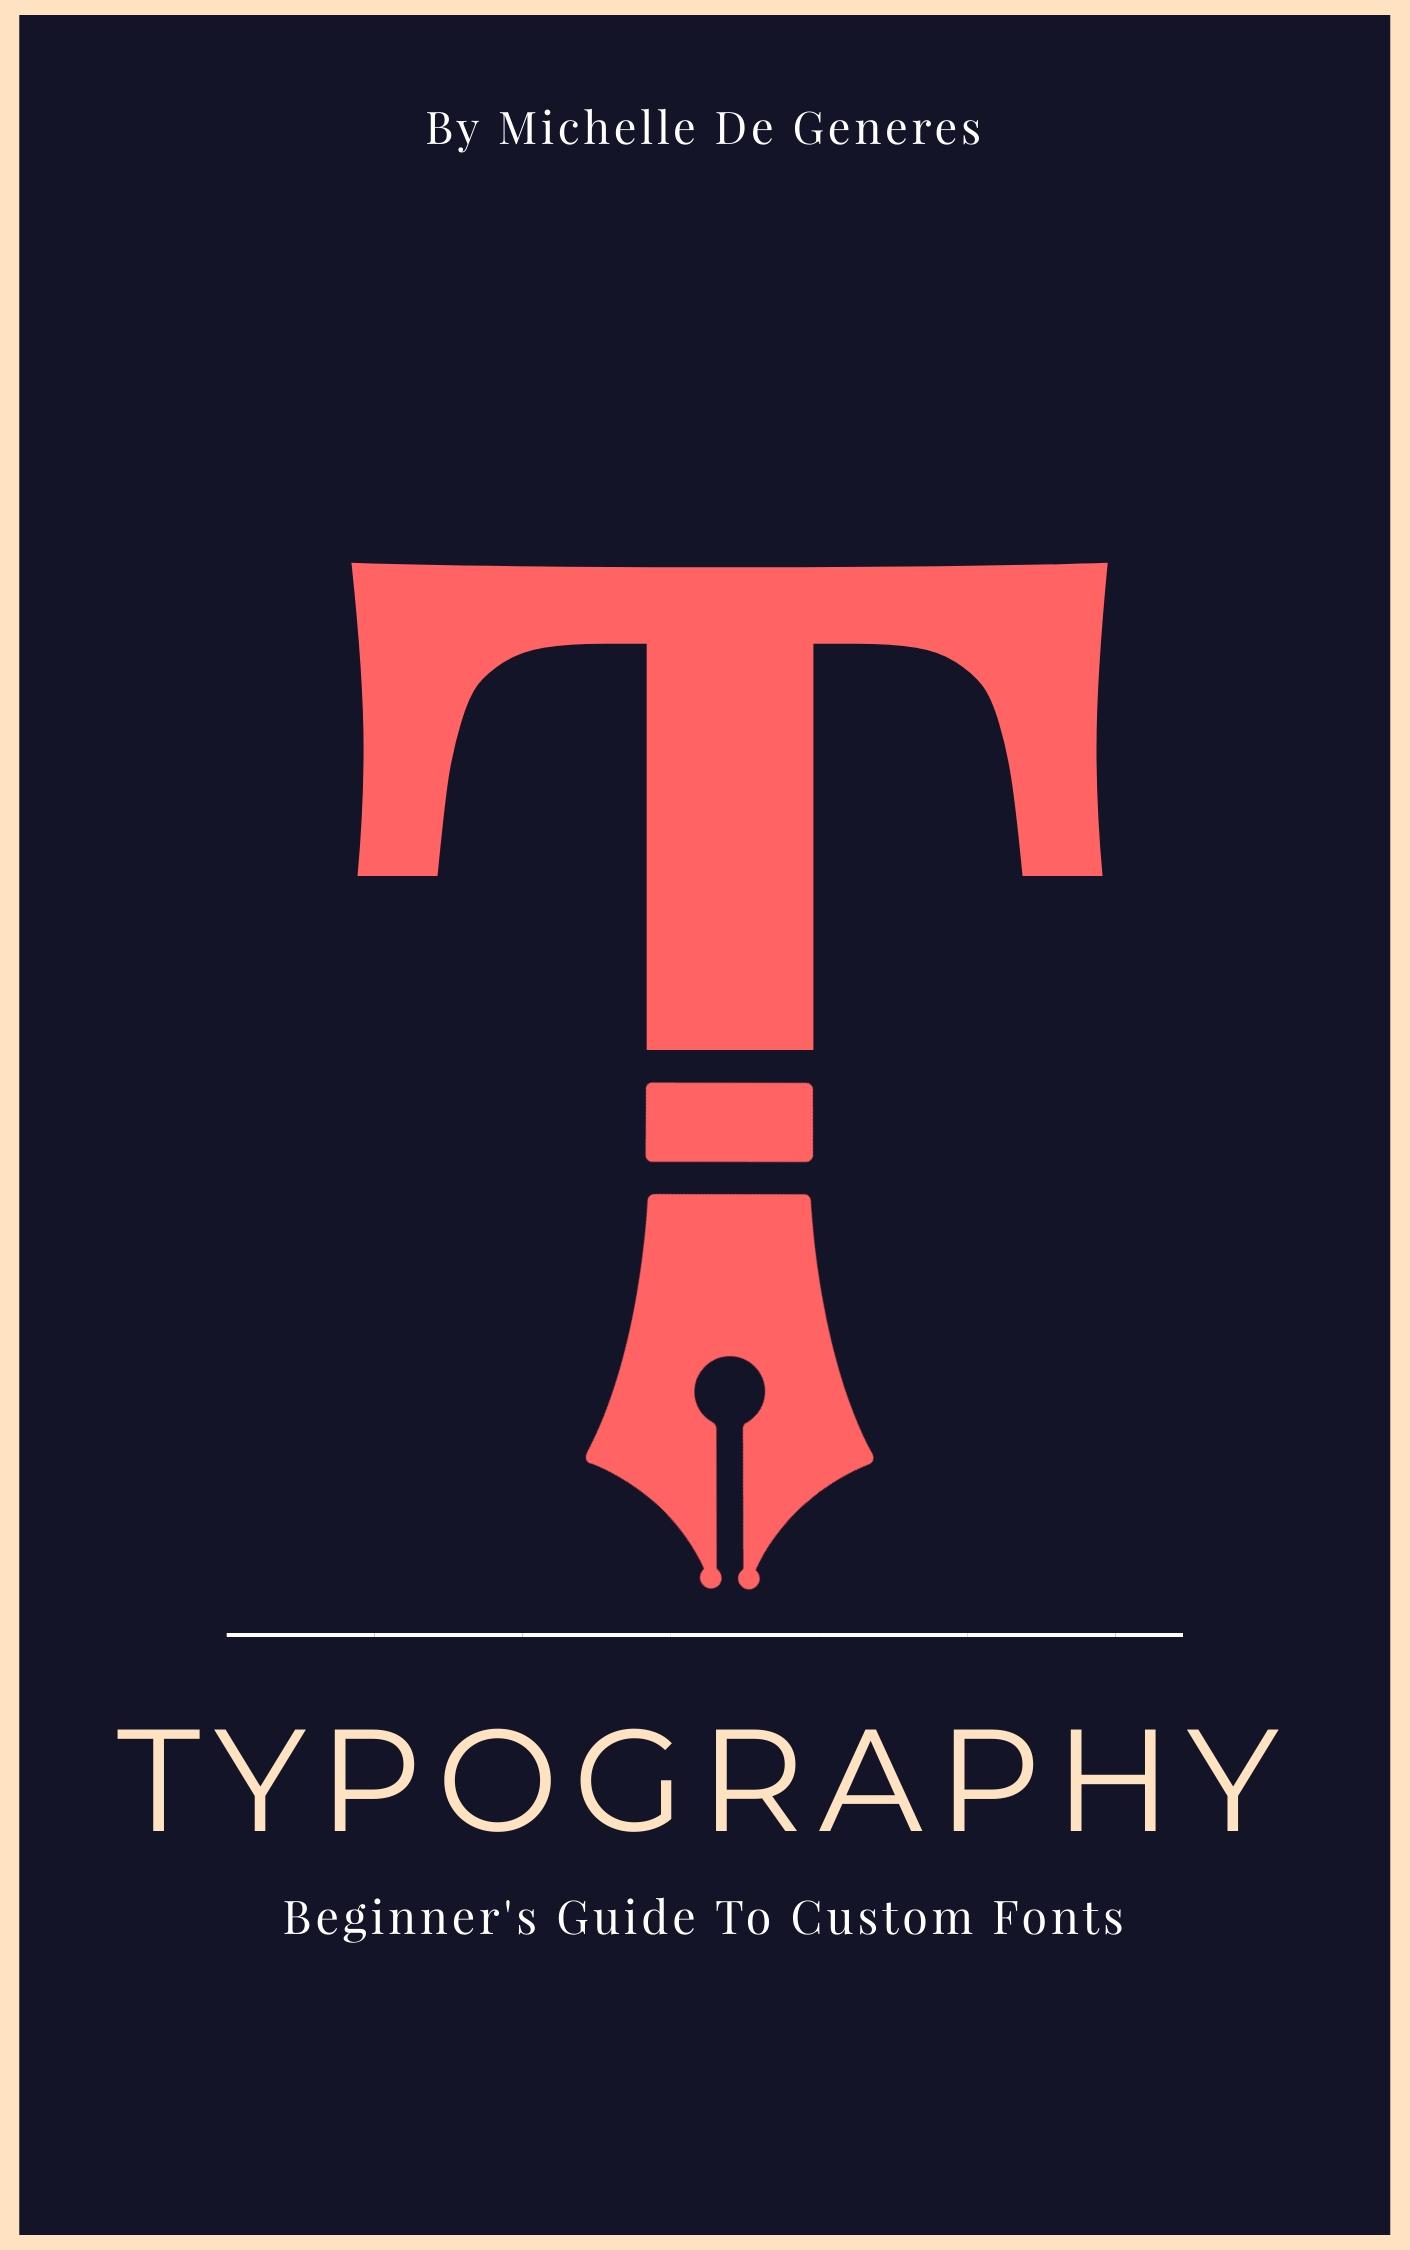 Creative - Book Cover Template